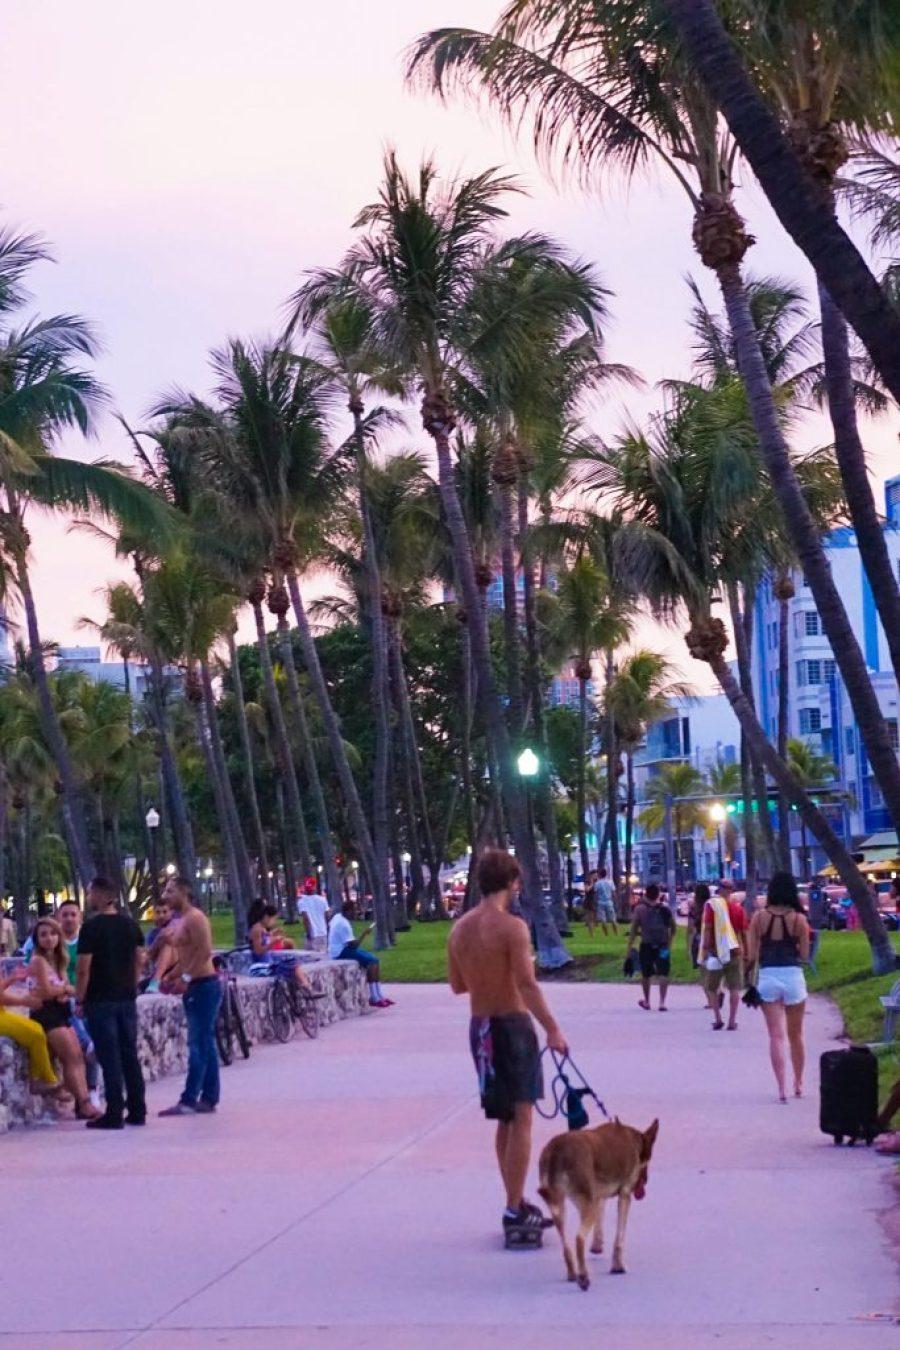 SoBe Beach Hostel & Bar - South Beach On The Cheap